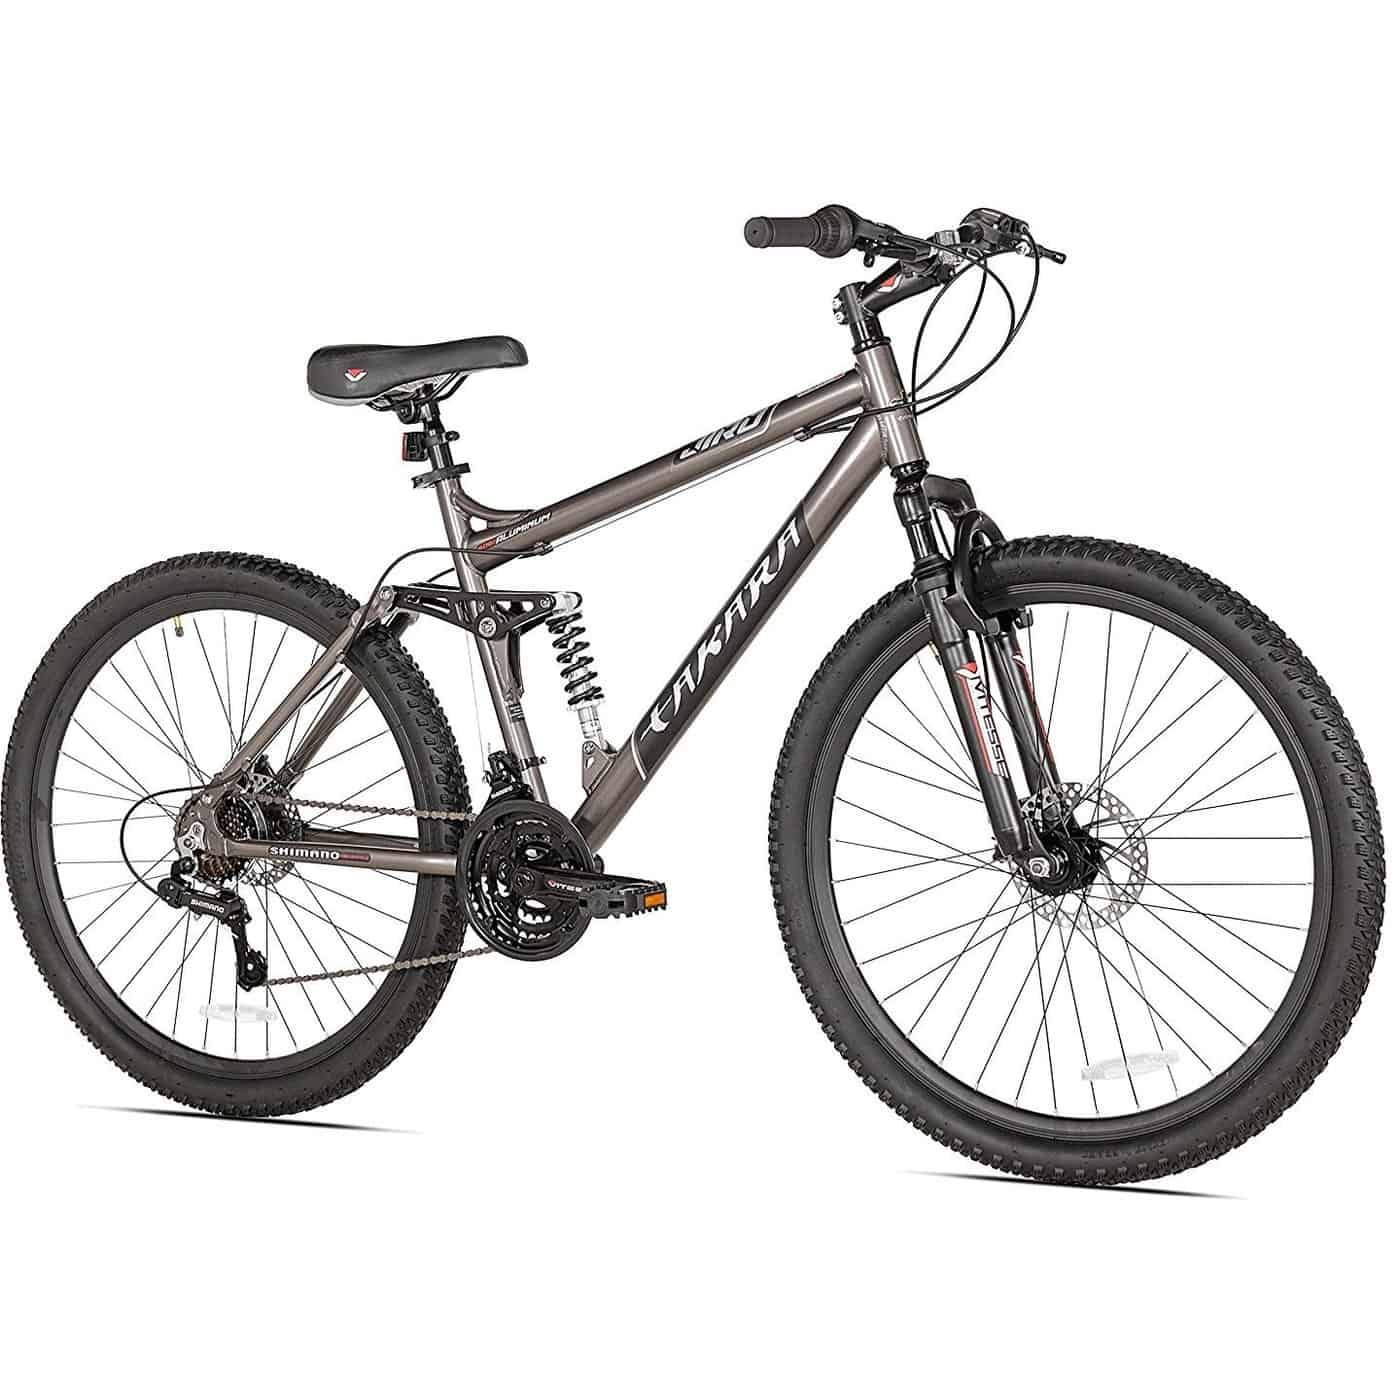 Takara Jiro Dual-Suspension Disc Brake Mountain Bike